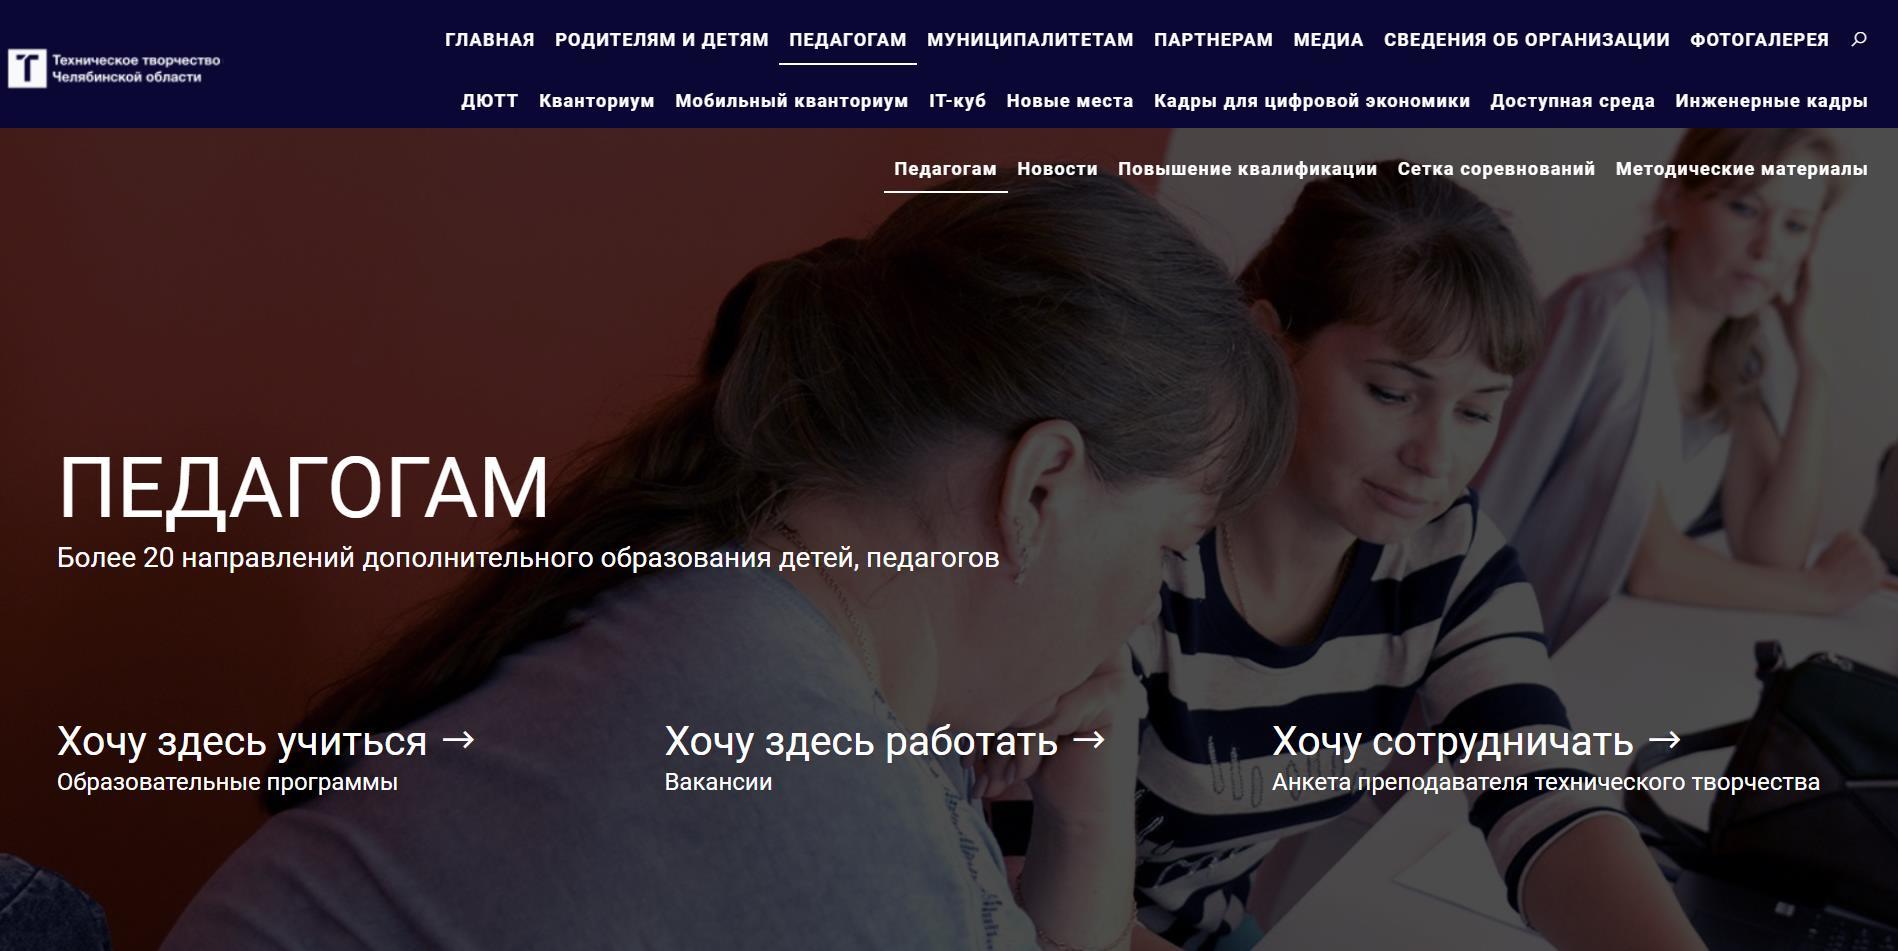 Сайт педагогам